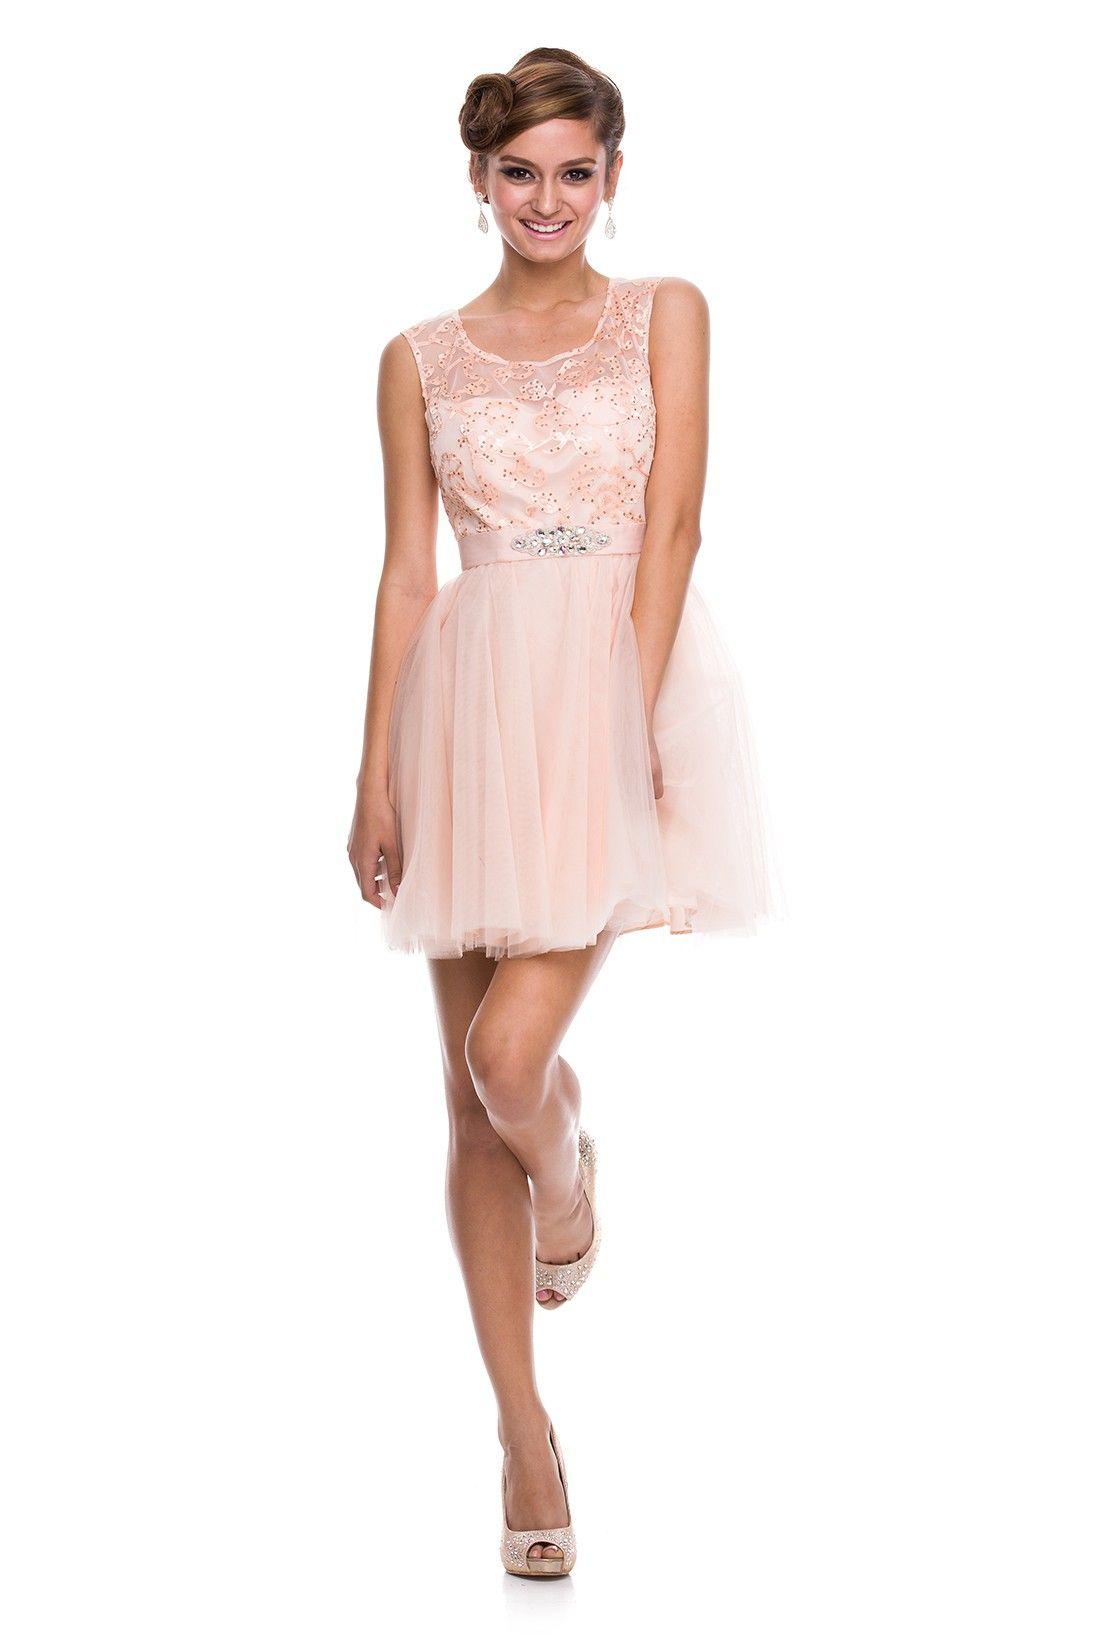 90851c4c220f 6021 - SHORT - ALL DRESSES -Nox Anabel Sort Cocktail Kjole